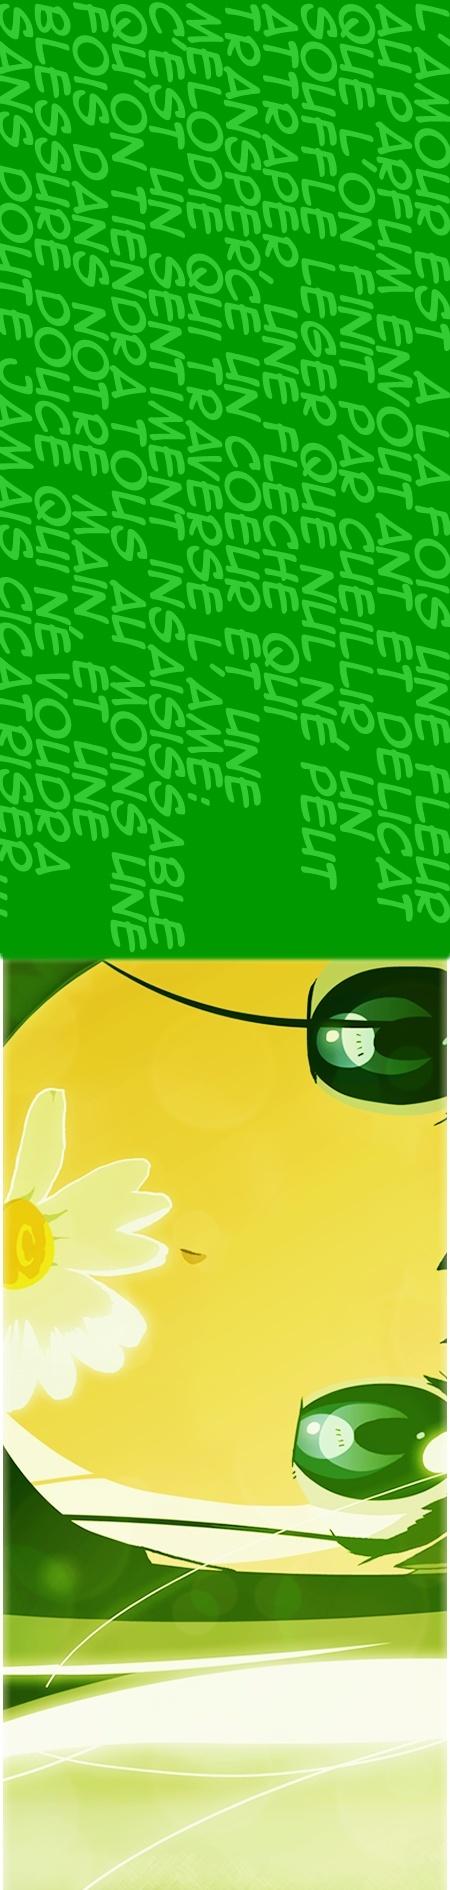 Créations de mary amely Manga11